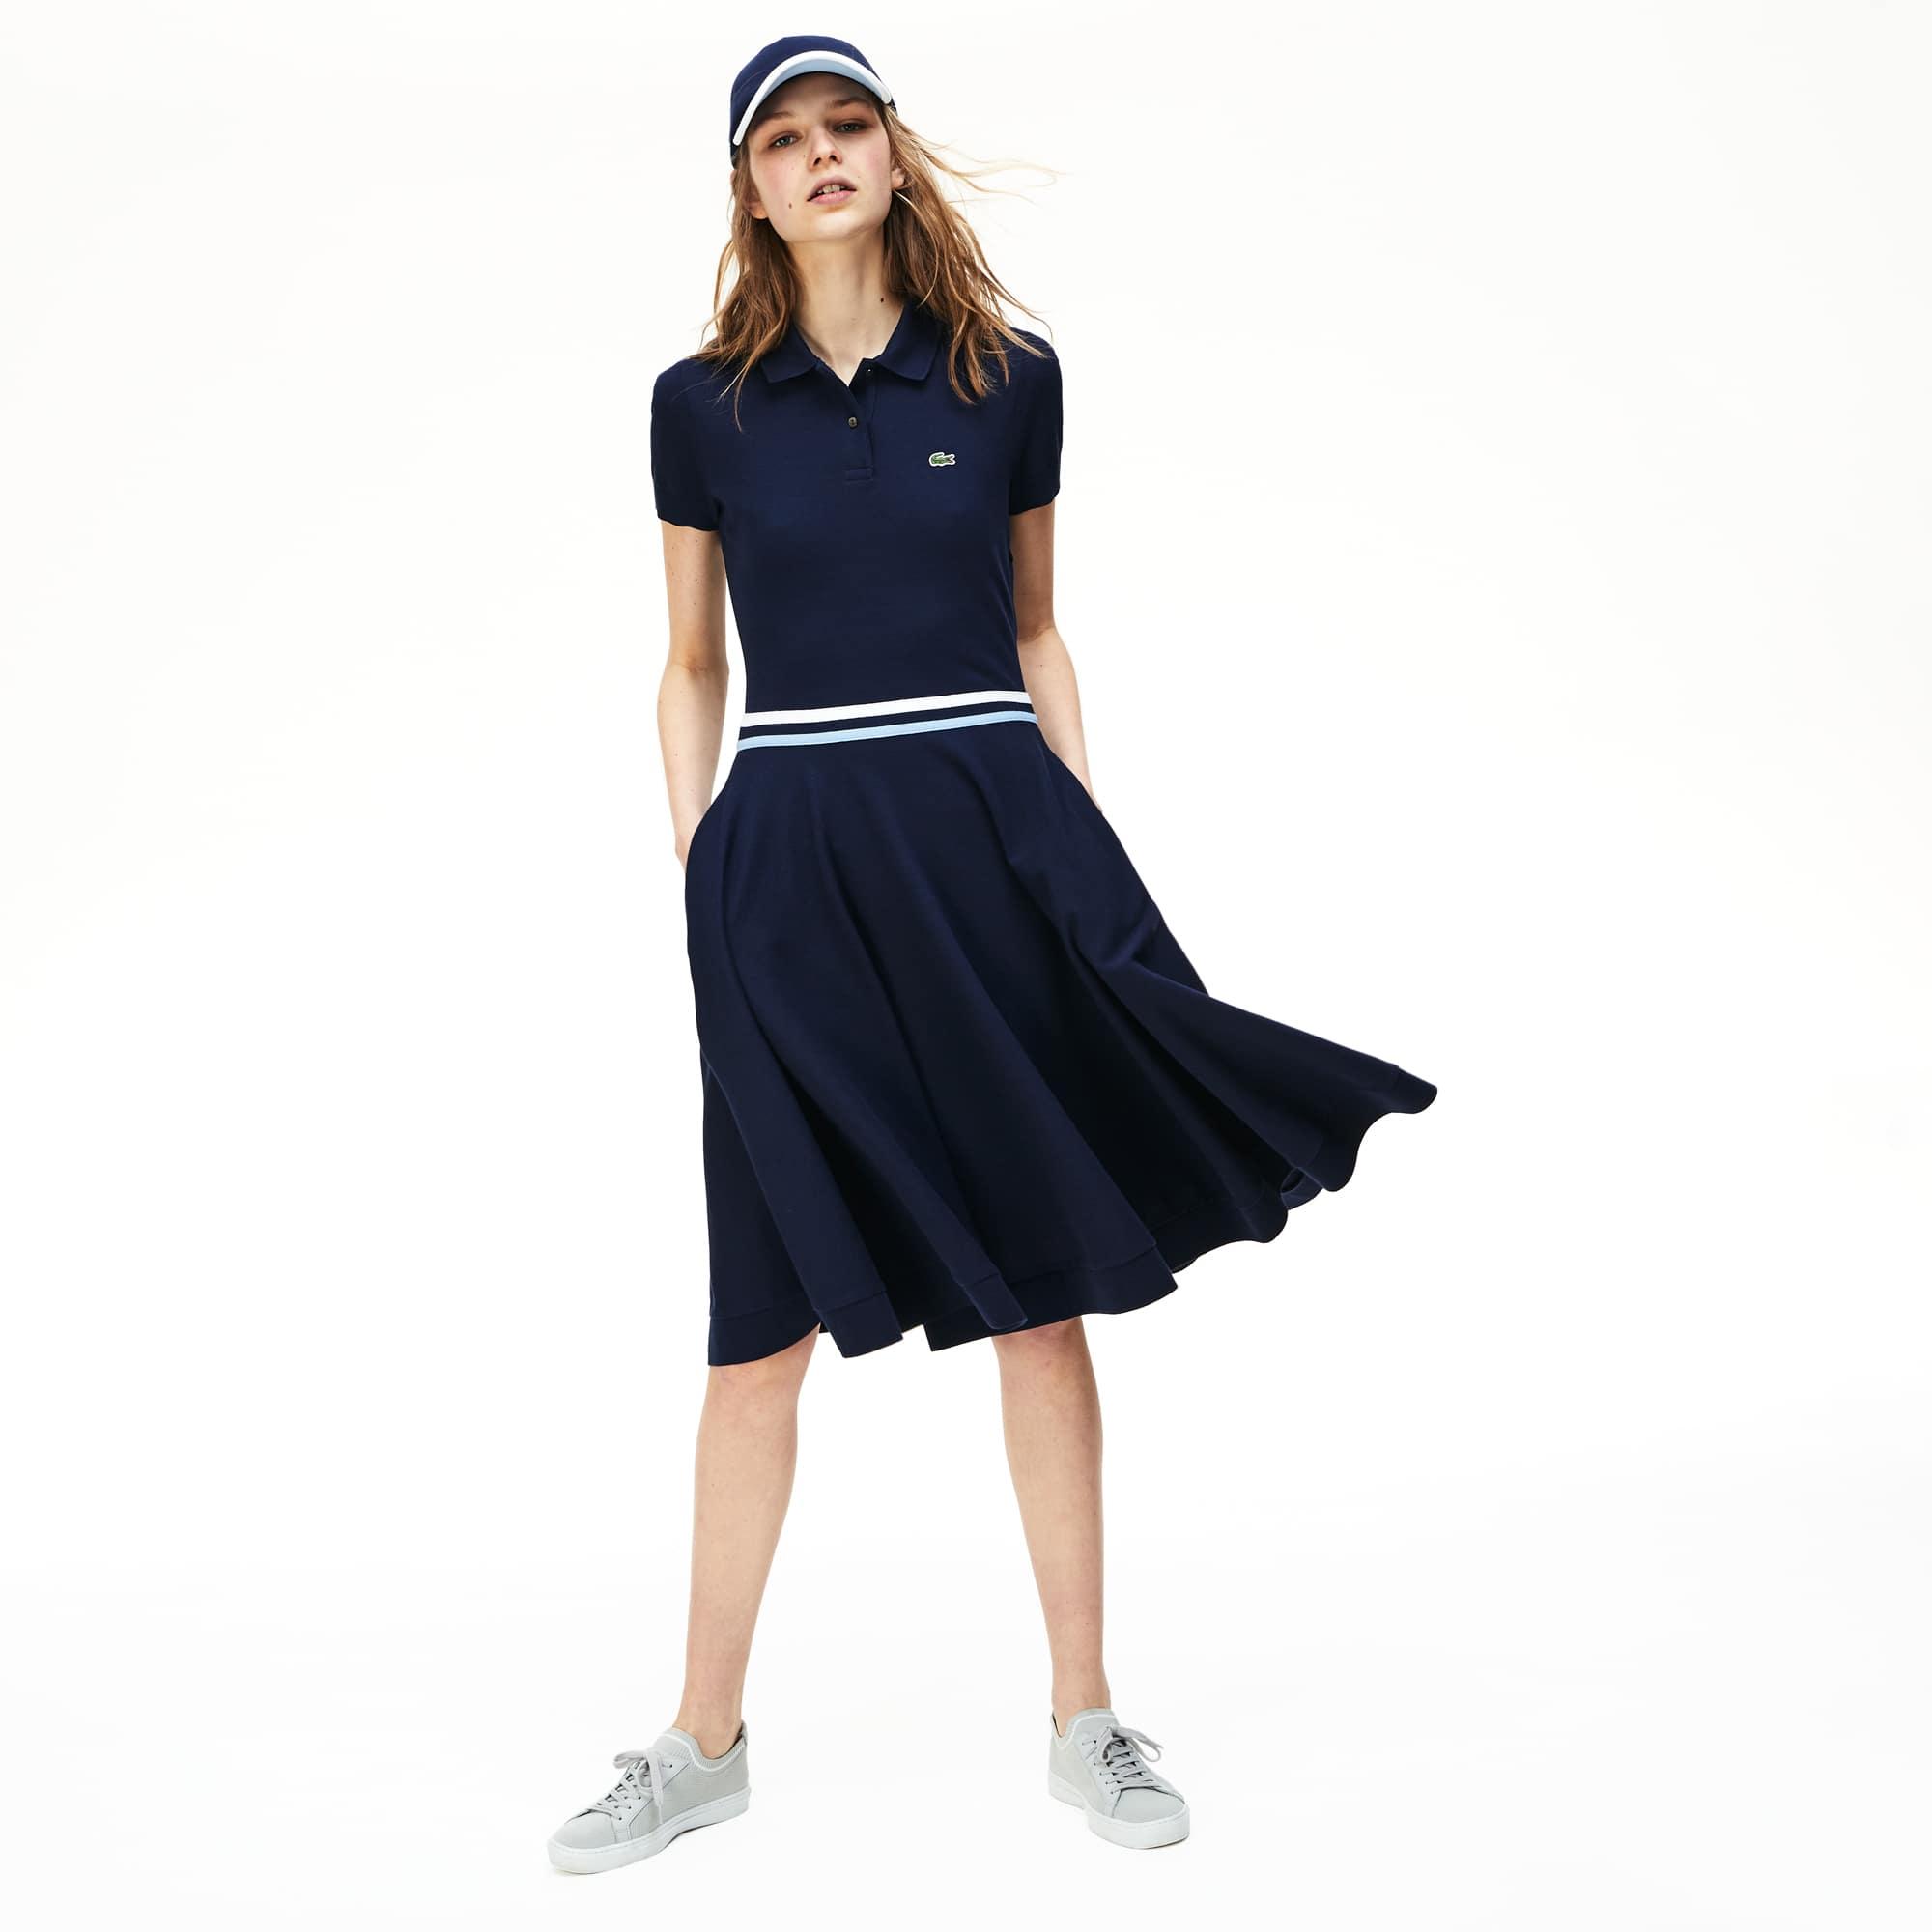 eca7b4454 Women's MADE IN FRANCE Tricolour Striped Mid-Length Polo Shirt Dress ...